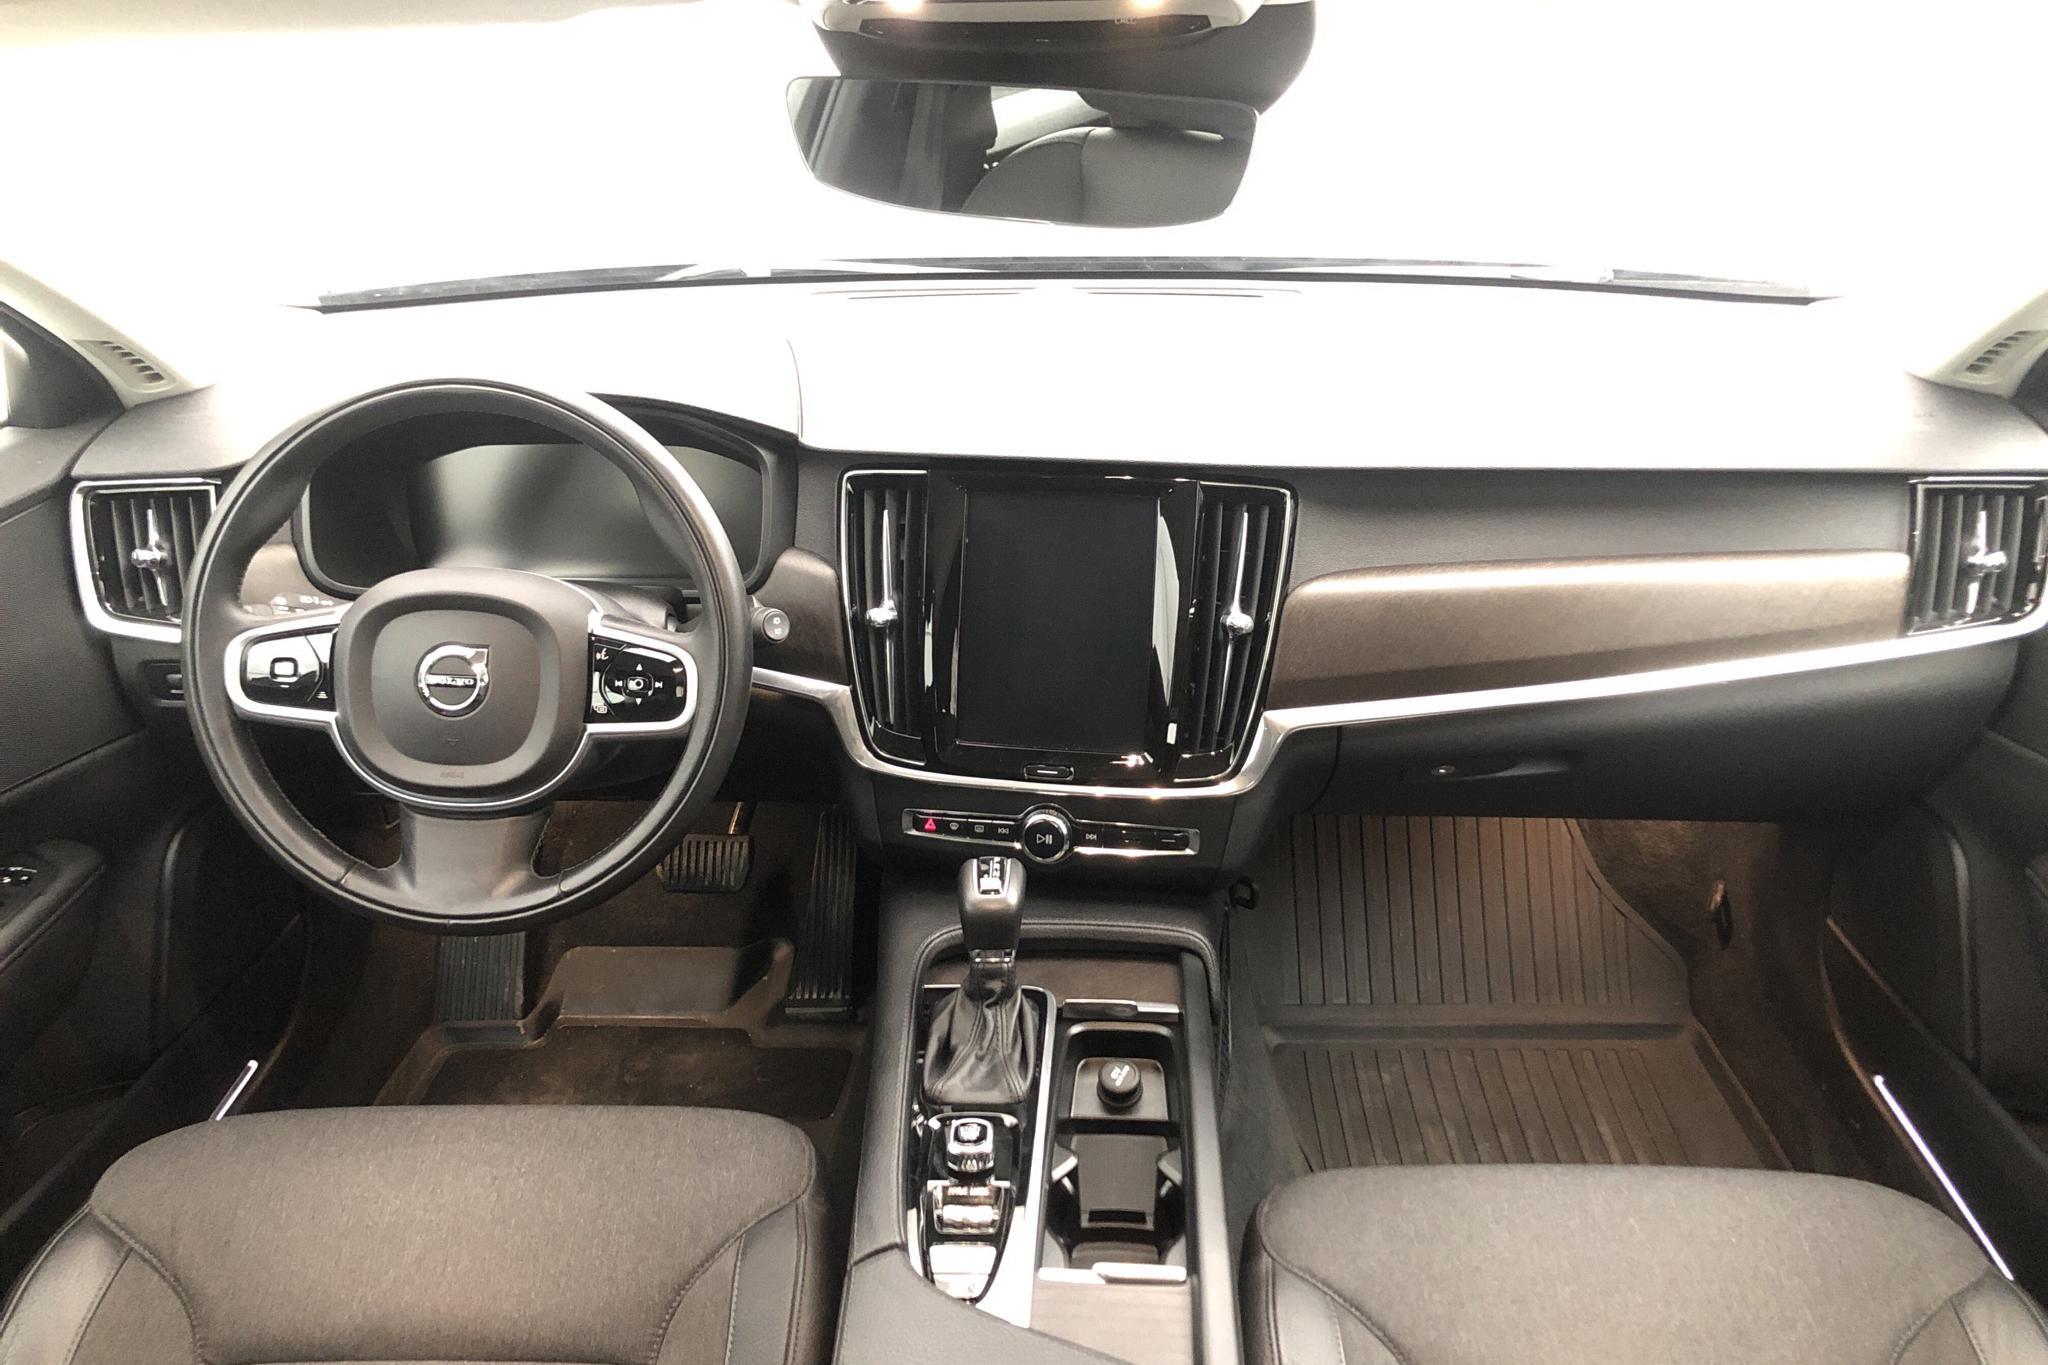 Volvo V90 D4 Cross Country AWD (190hk) - 73 200 km - Automatic - gray - 2019